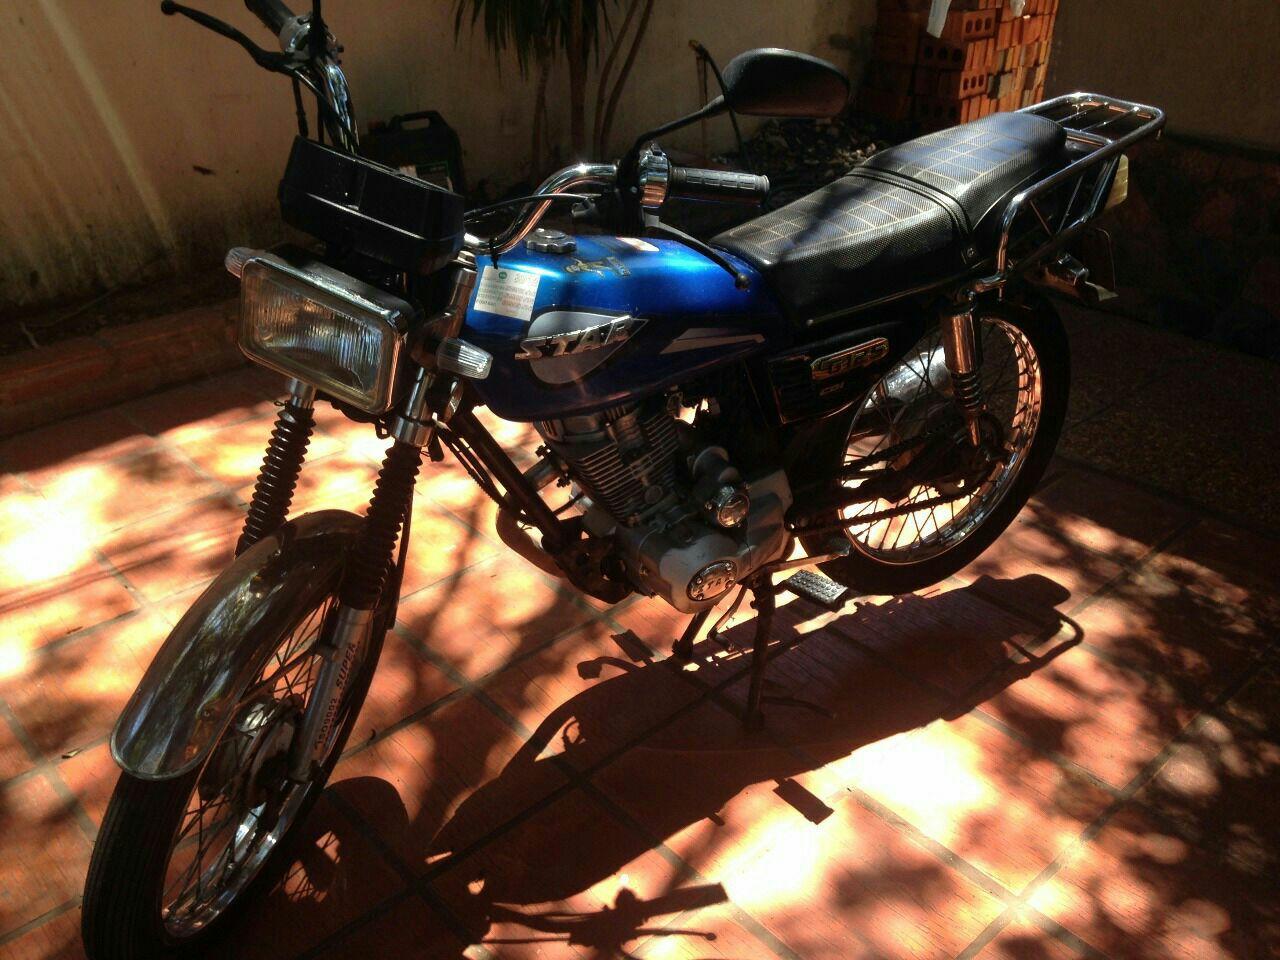 Moto Star CG 150 cc 2013